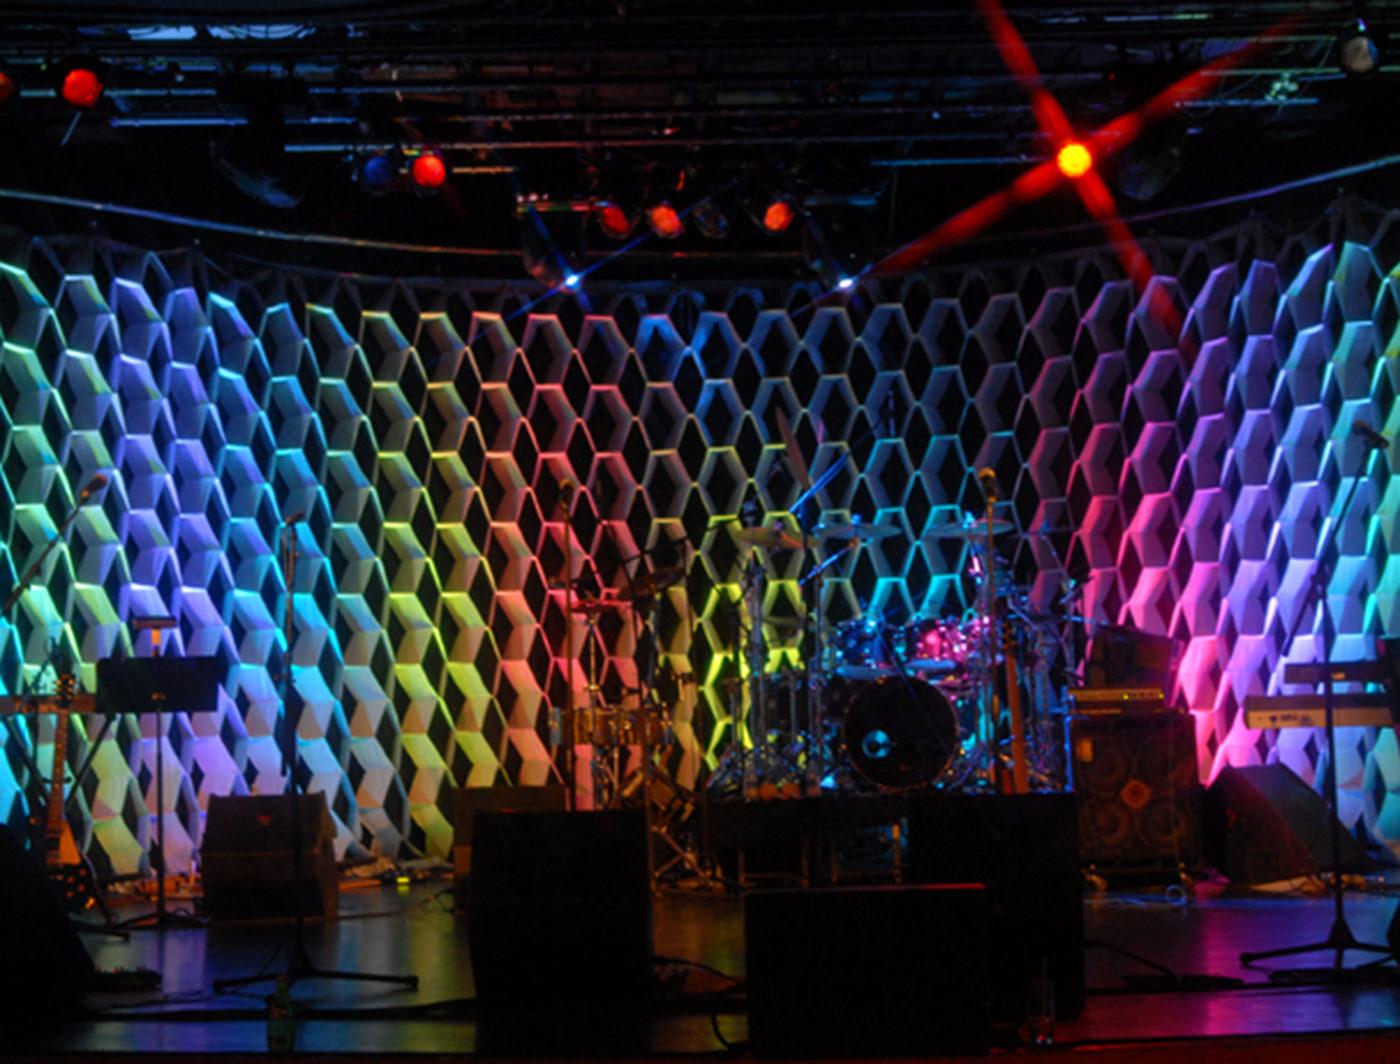 Misia Origami Rental Backdrops Rental Decor From Atomic Design